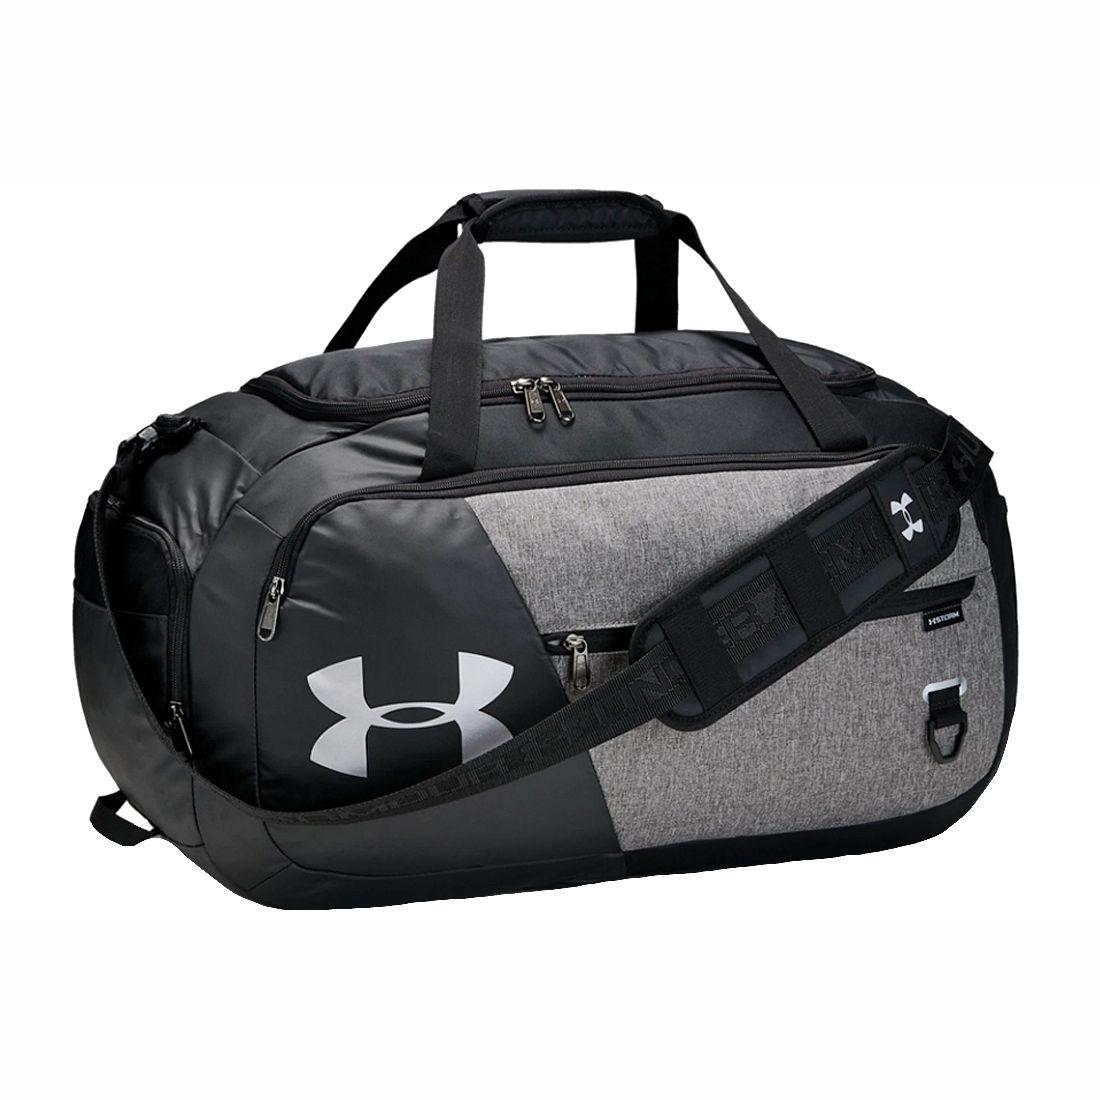 Bags -  under armour UA Undeniable 4.0 Medium Duffle Bag 2657